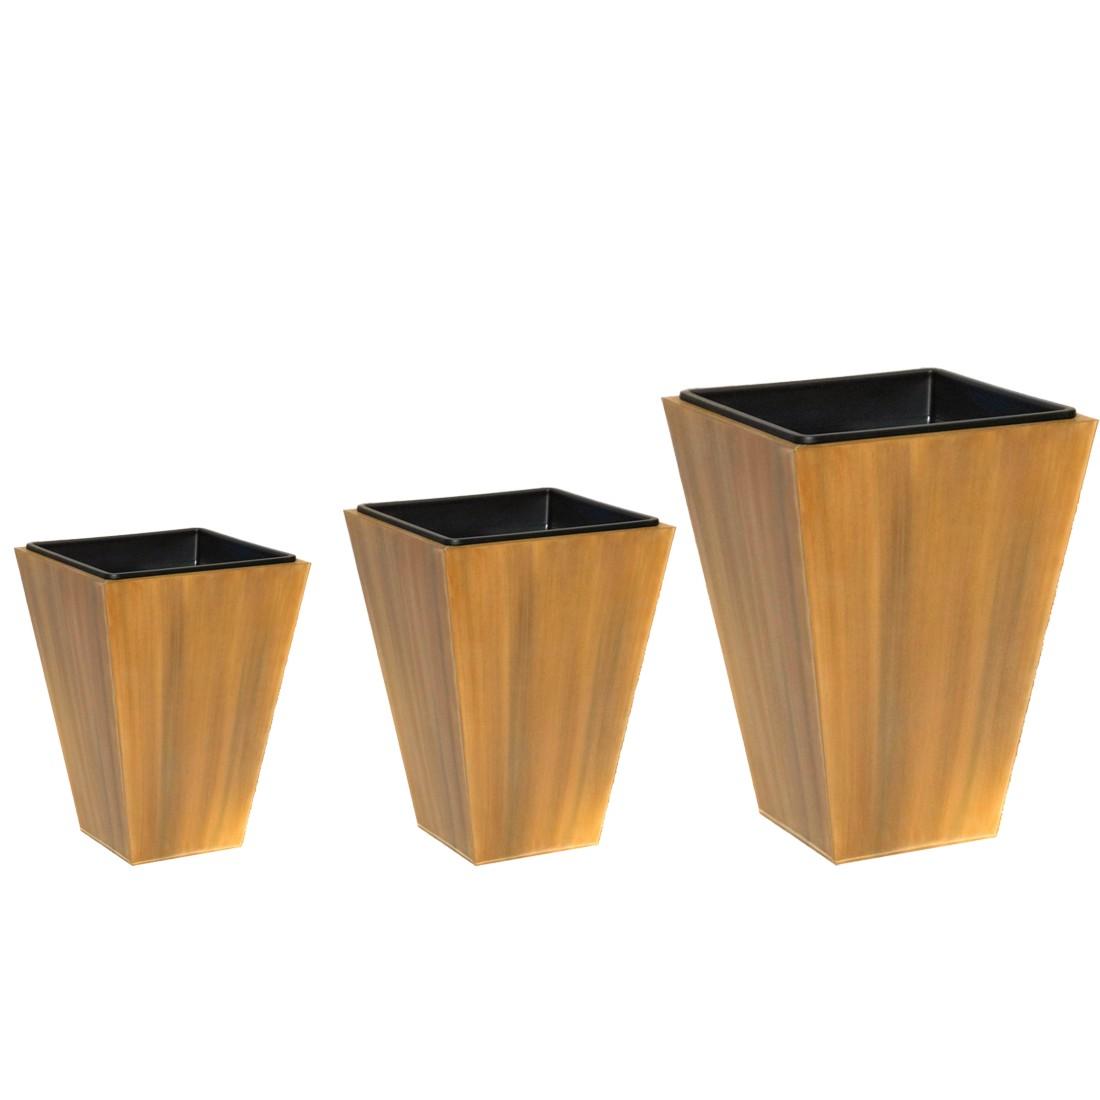 Pflanzkübel Wood – Zink – Little Sky – 3er-Set, Helmes Home & Garden günstig bestellen